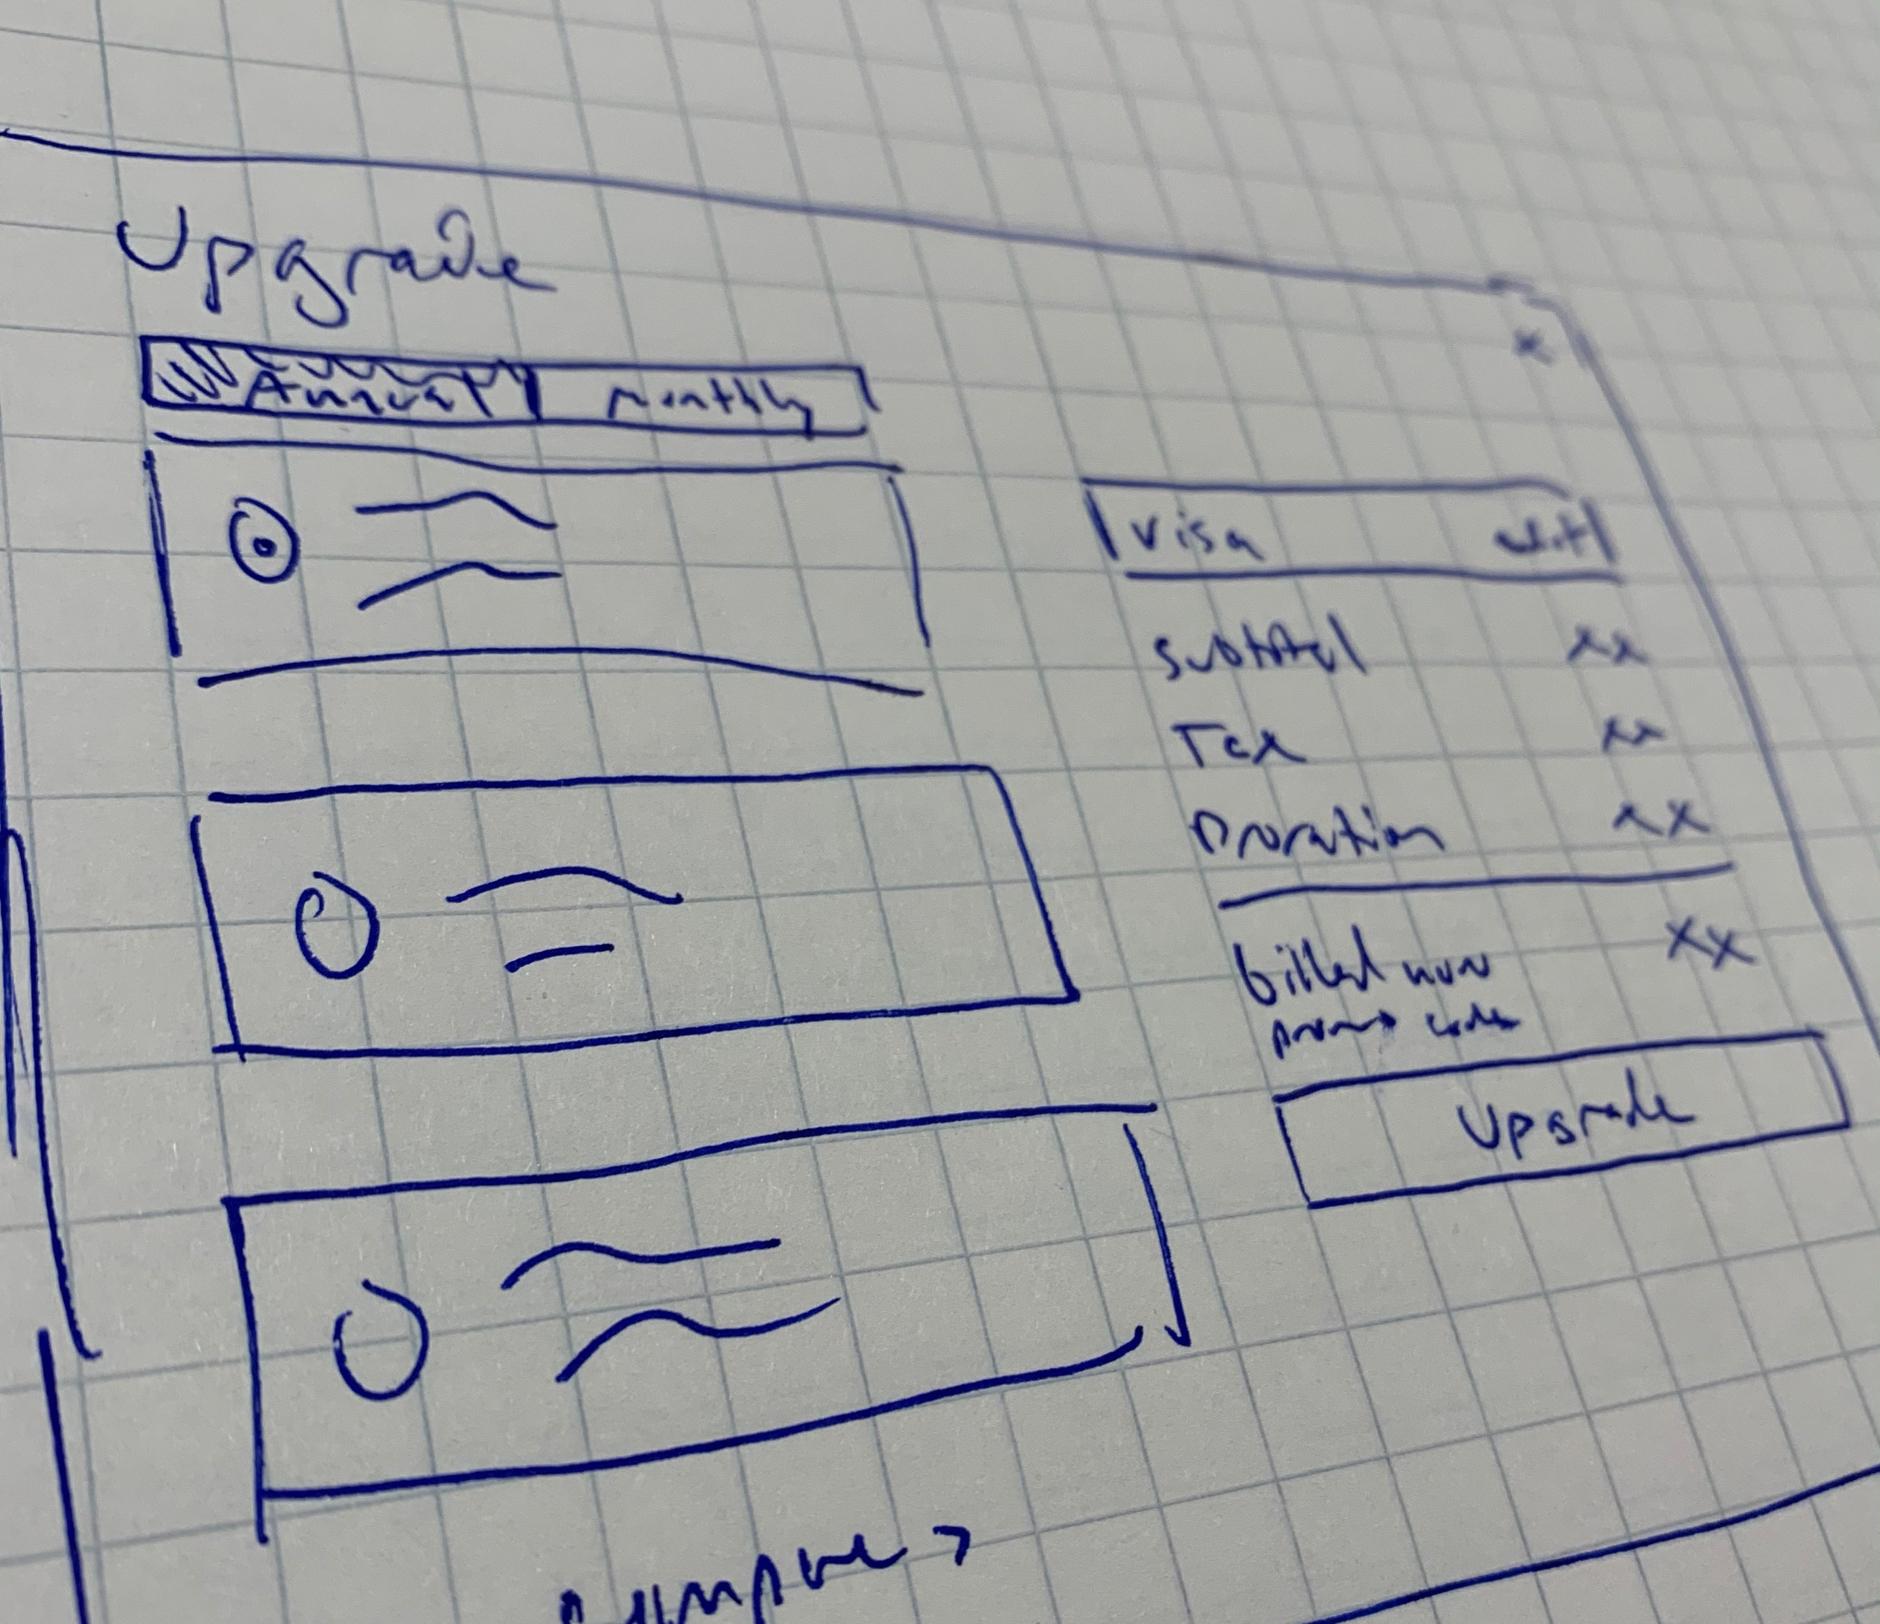 Sketch of upgrade flow